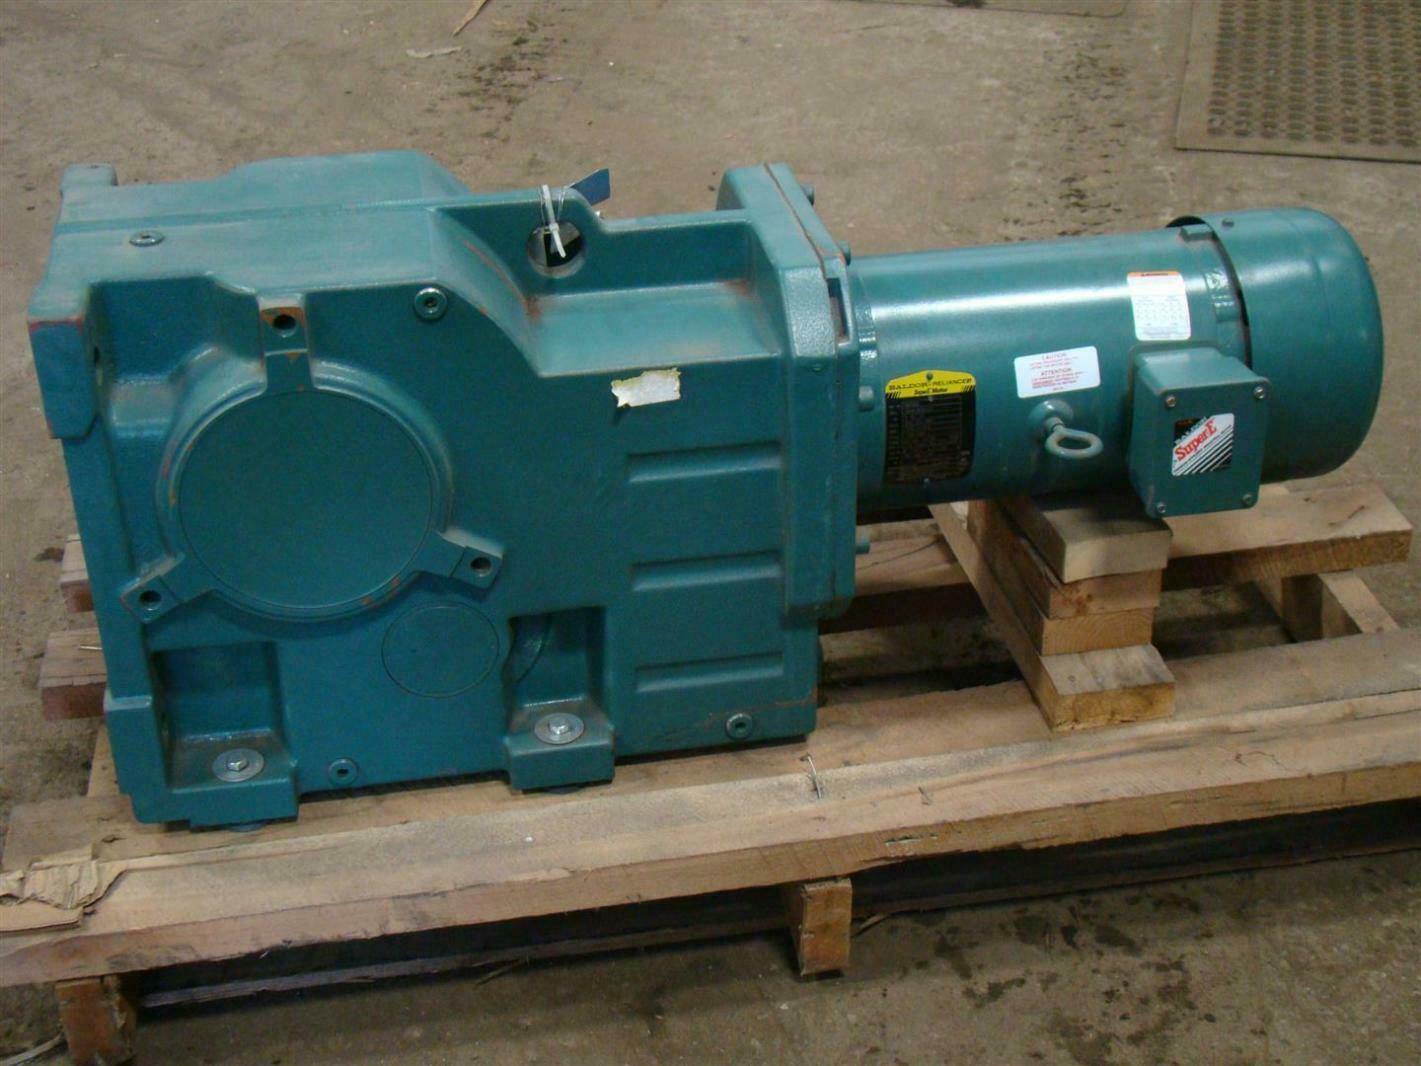 Baldor reliancer supere gear motor 5 hp 10 1 208 230 460v for Baldor reliance motor parts